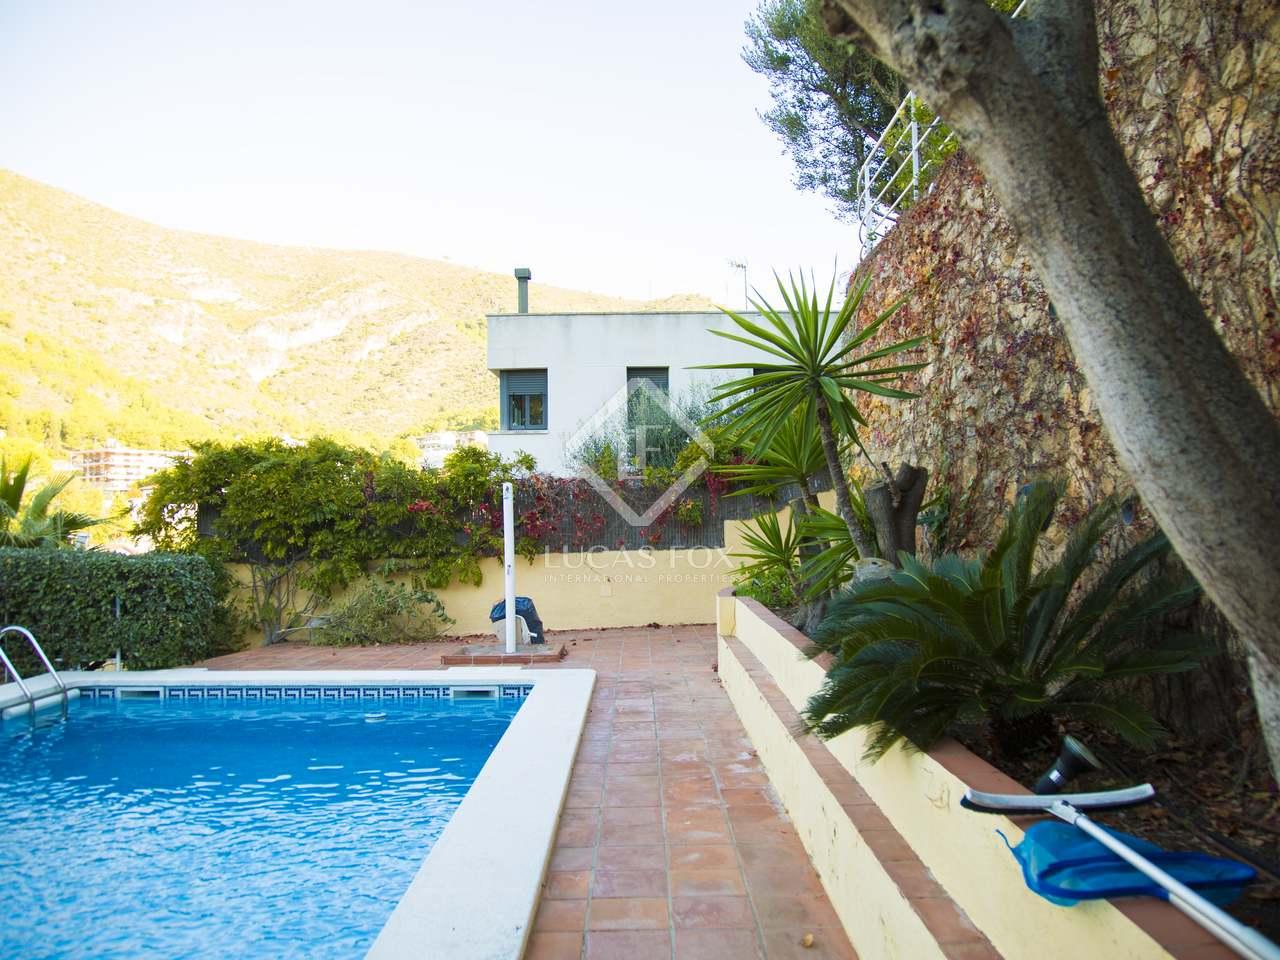 Casa de 416m con piscina en alquiler en castelldefels for Piscina castelldefels